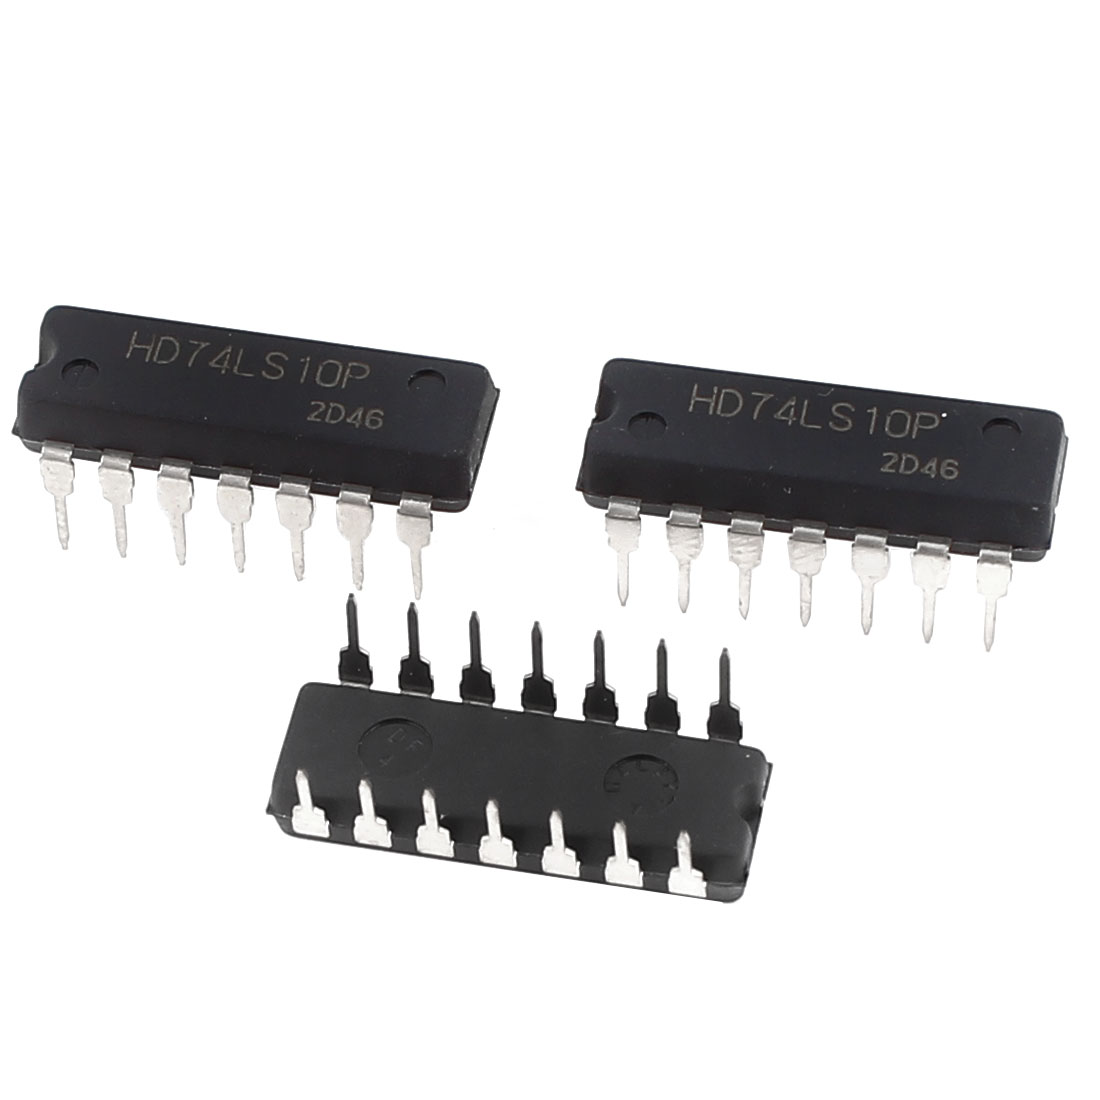 3Pcs HD74LS10P Triple 3-Input Positive NAND Gate DIP-14 IC